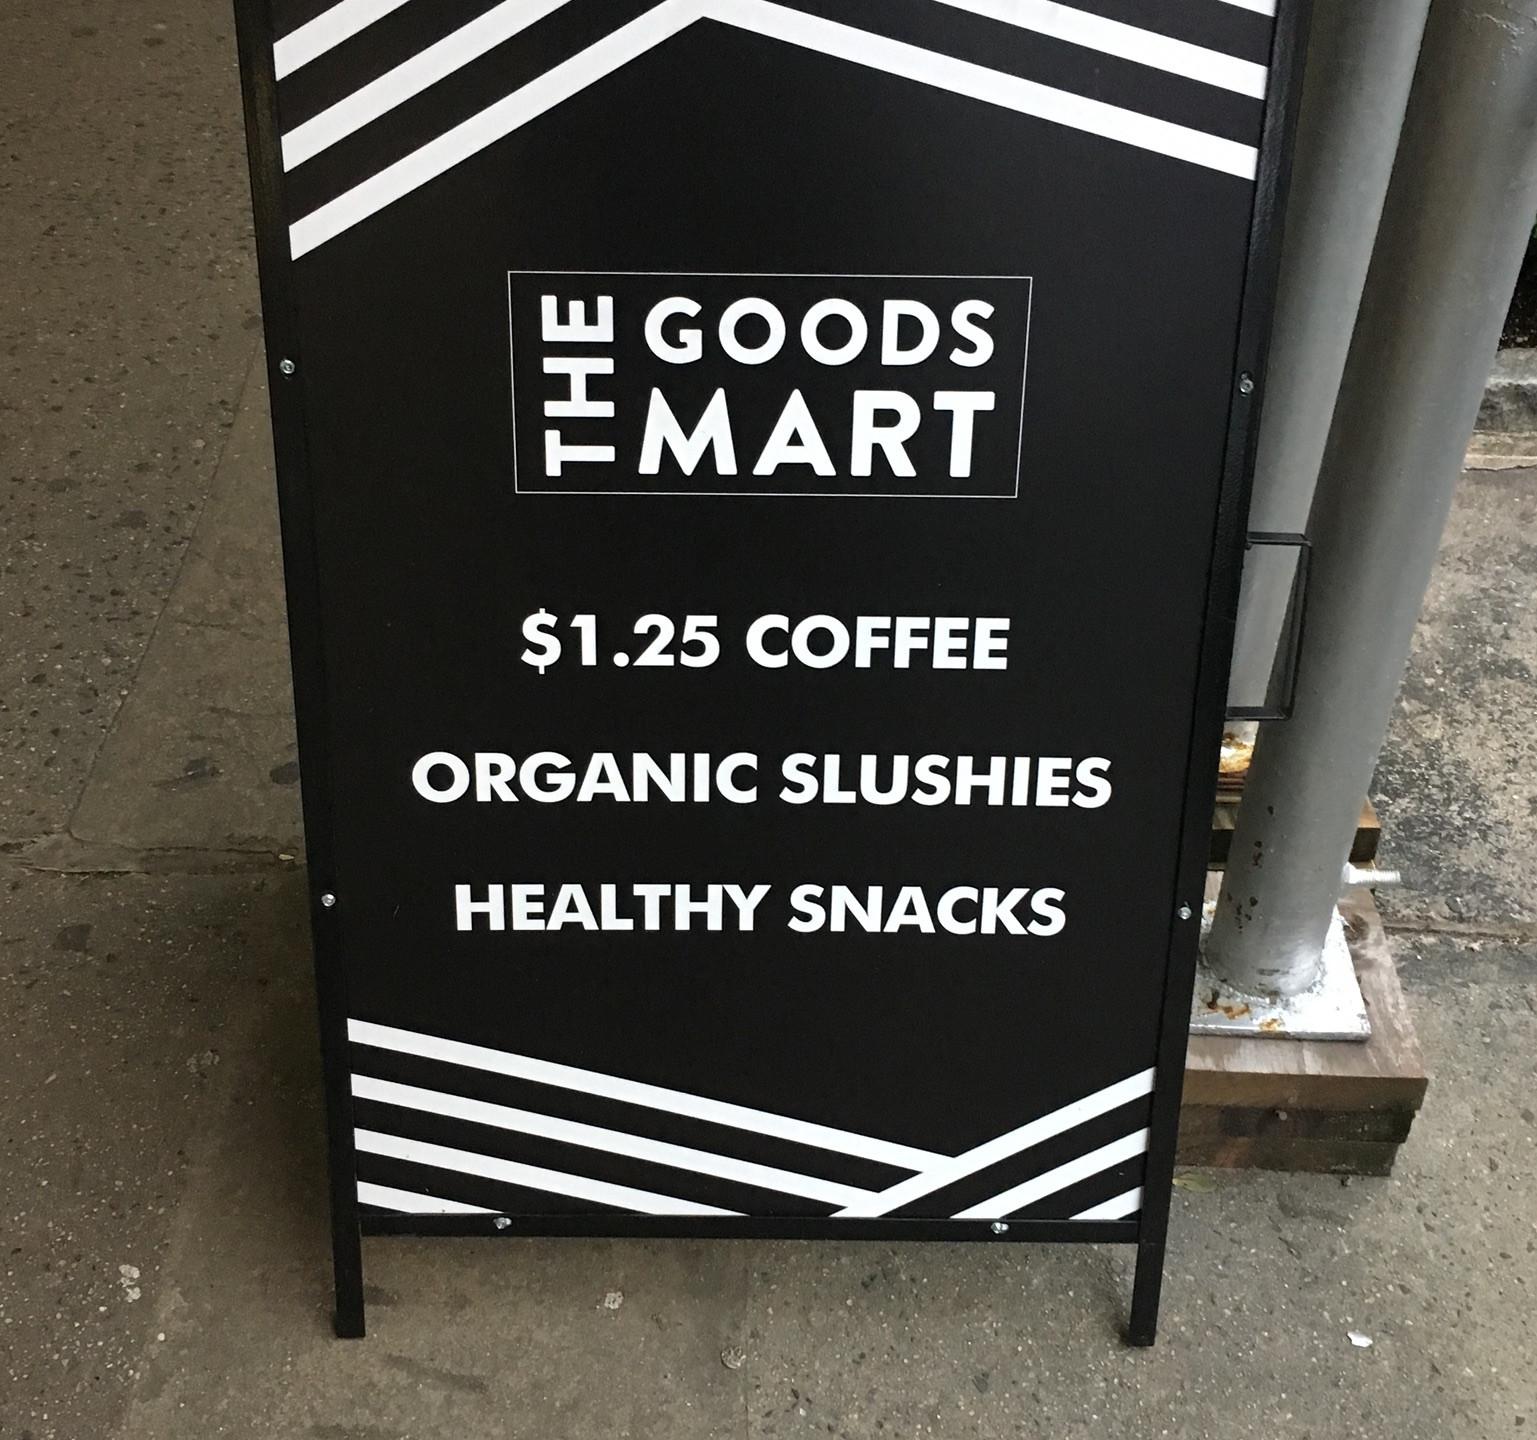 The Goods Mart sandwich board sign